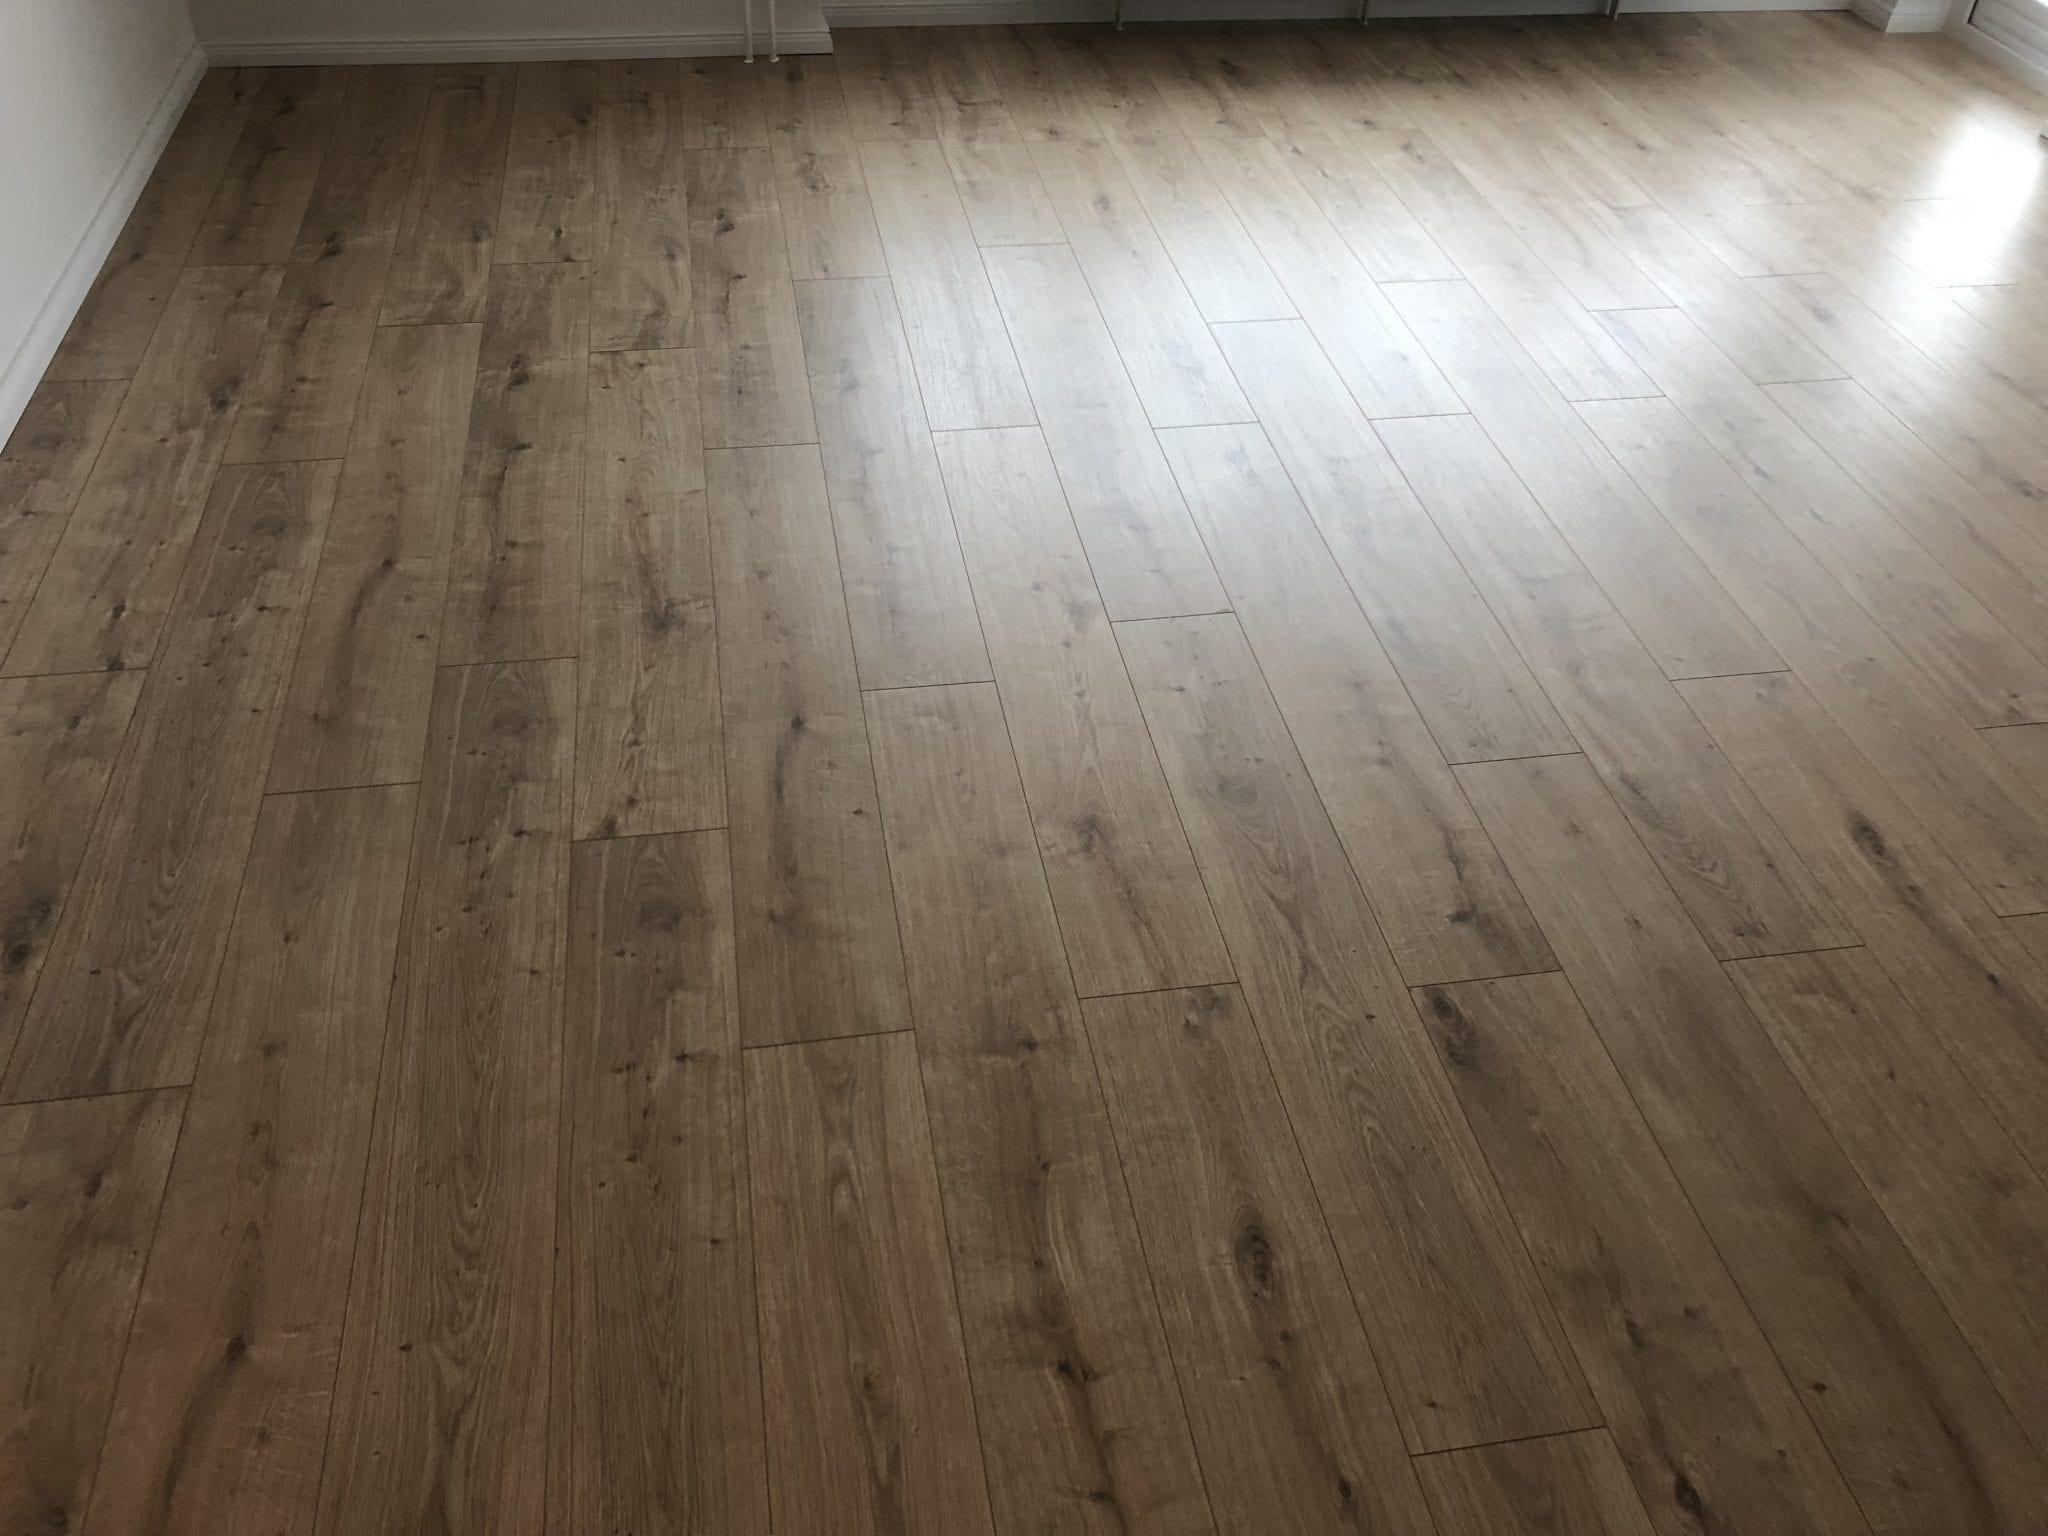 Fußboden Verlegen Ahrensburg ~ Bodenlegerarbeiten bodenleger hamburg boden verlegen lassen jetzt